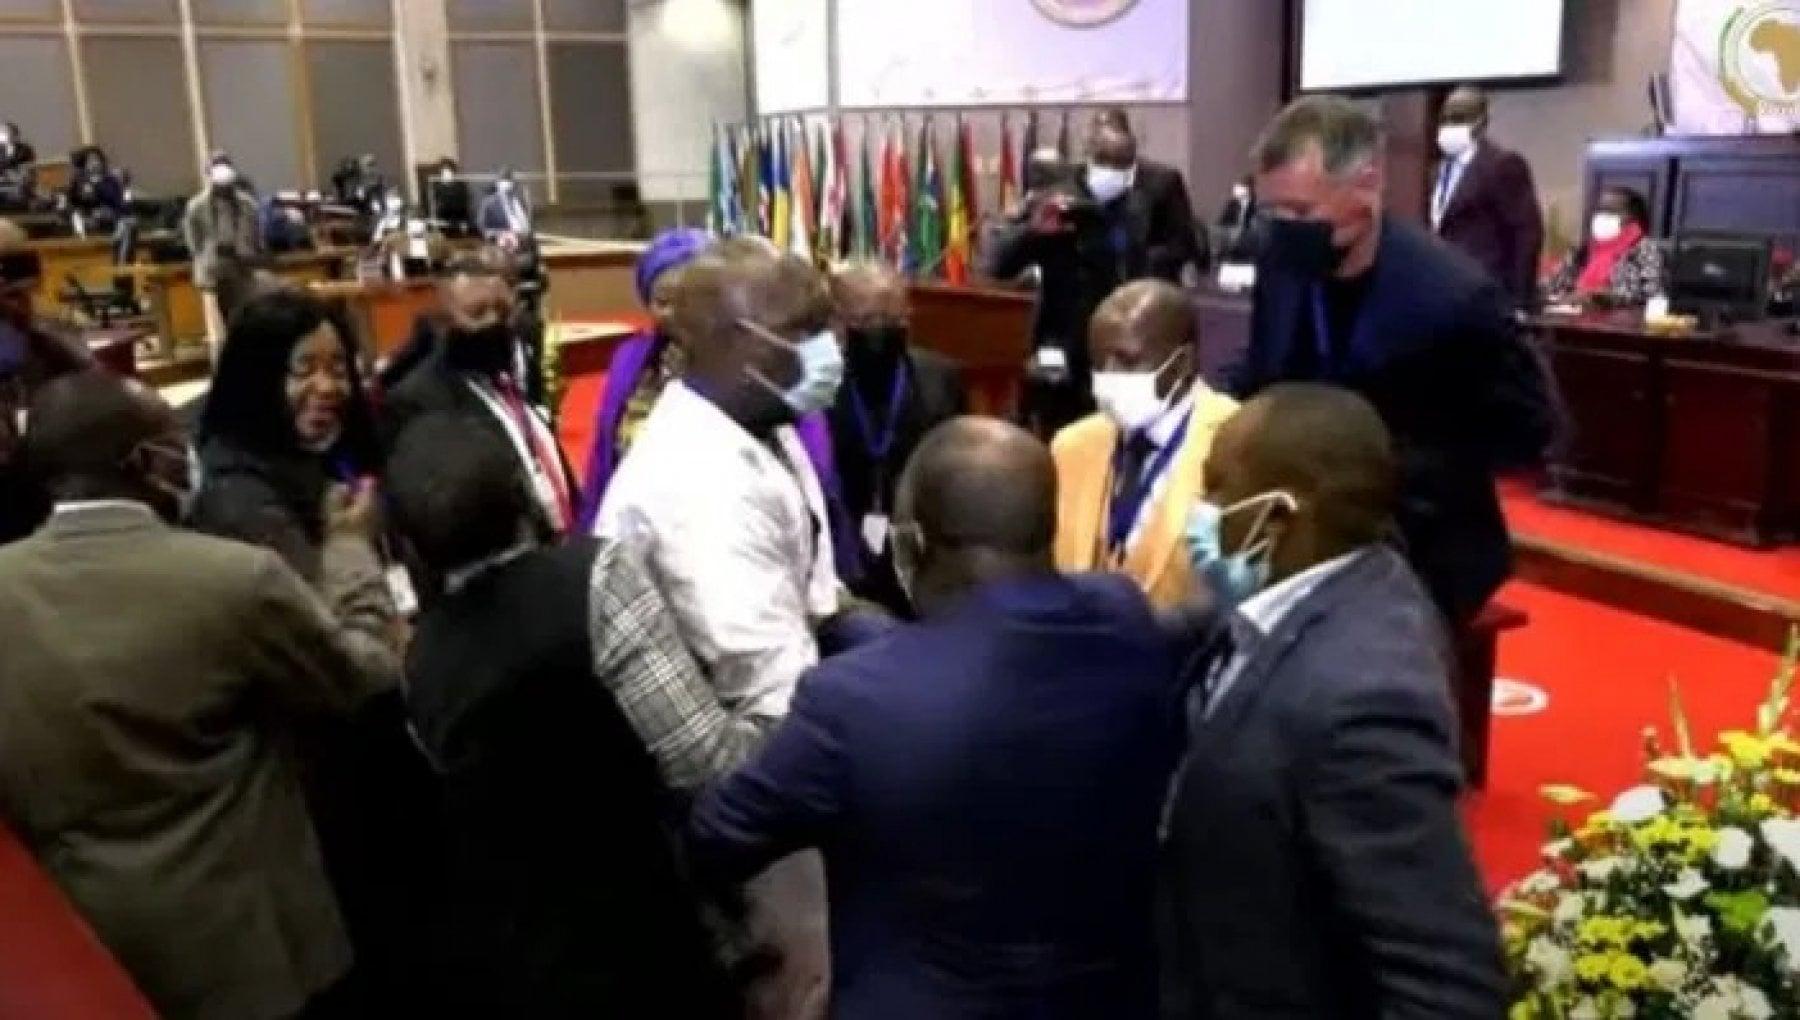 132708929 a21e073e c3c9 4ed3 8752 59aab83538b7 - Sudafrica, pugni, calci e schiaffi: è caos all'assemblea dell'Unione africana